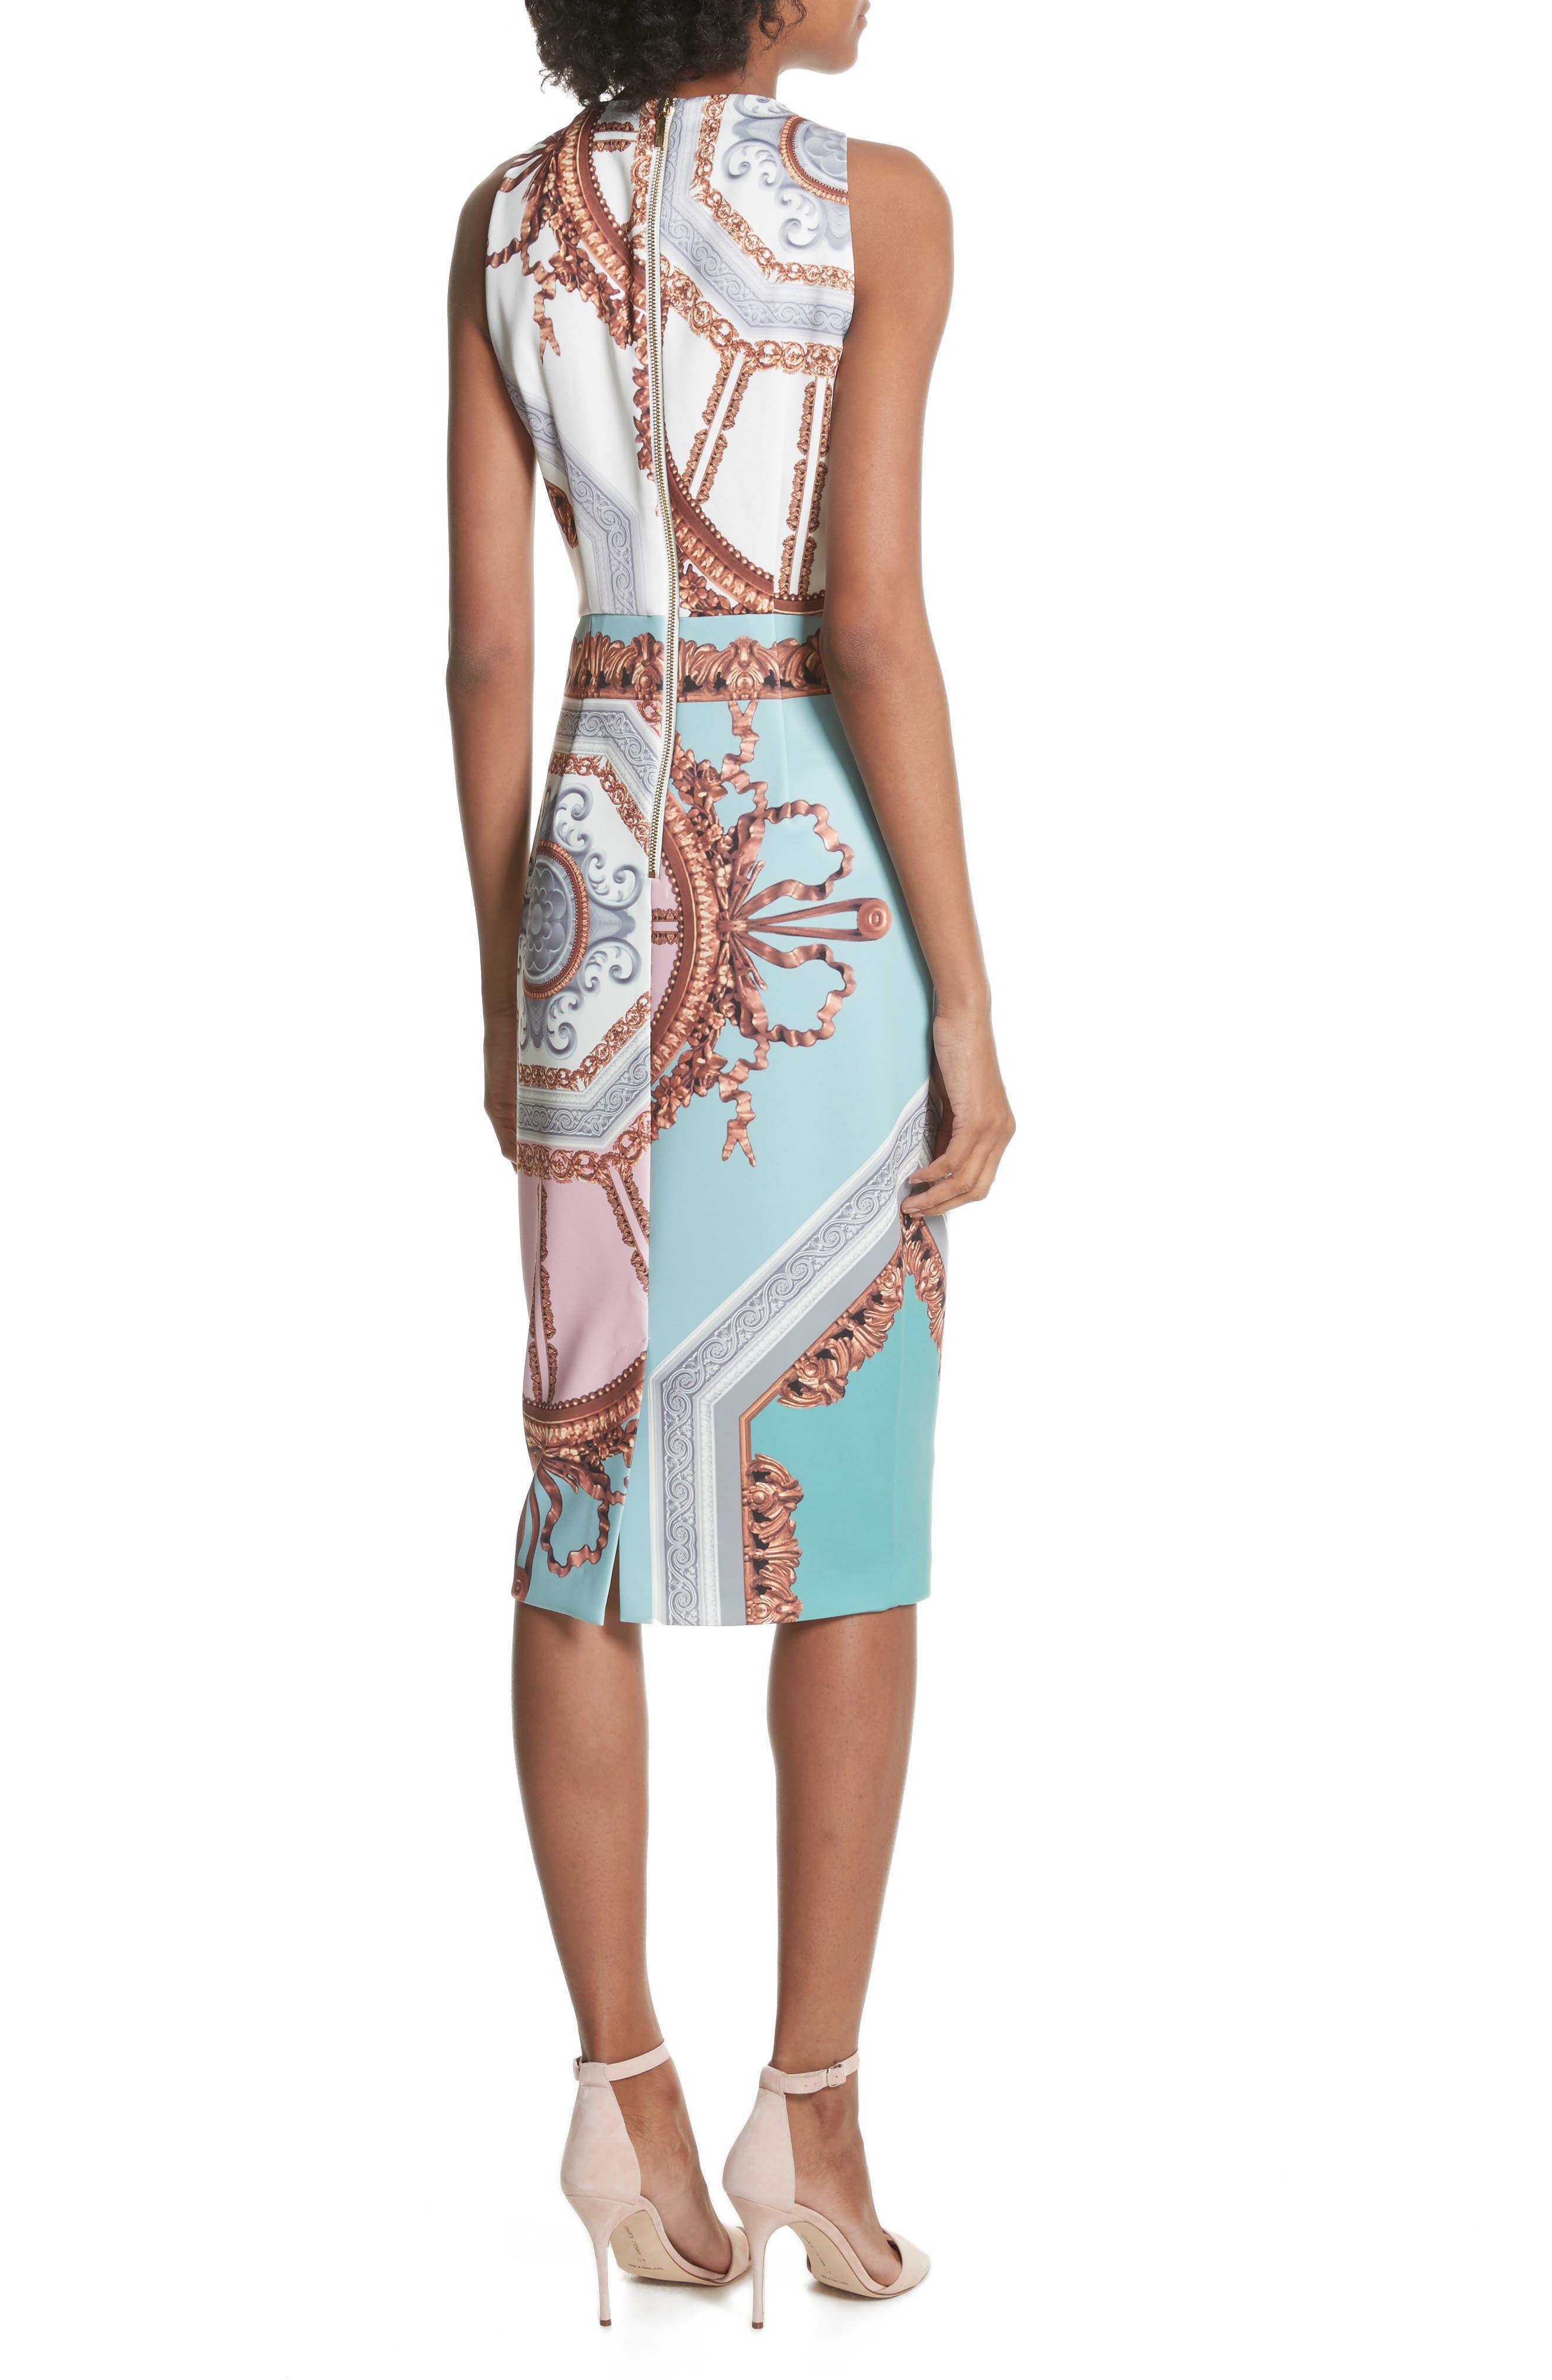 Orlla Embellished Midi Dress,                             Alternate thumbnail 2, color,                             440